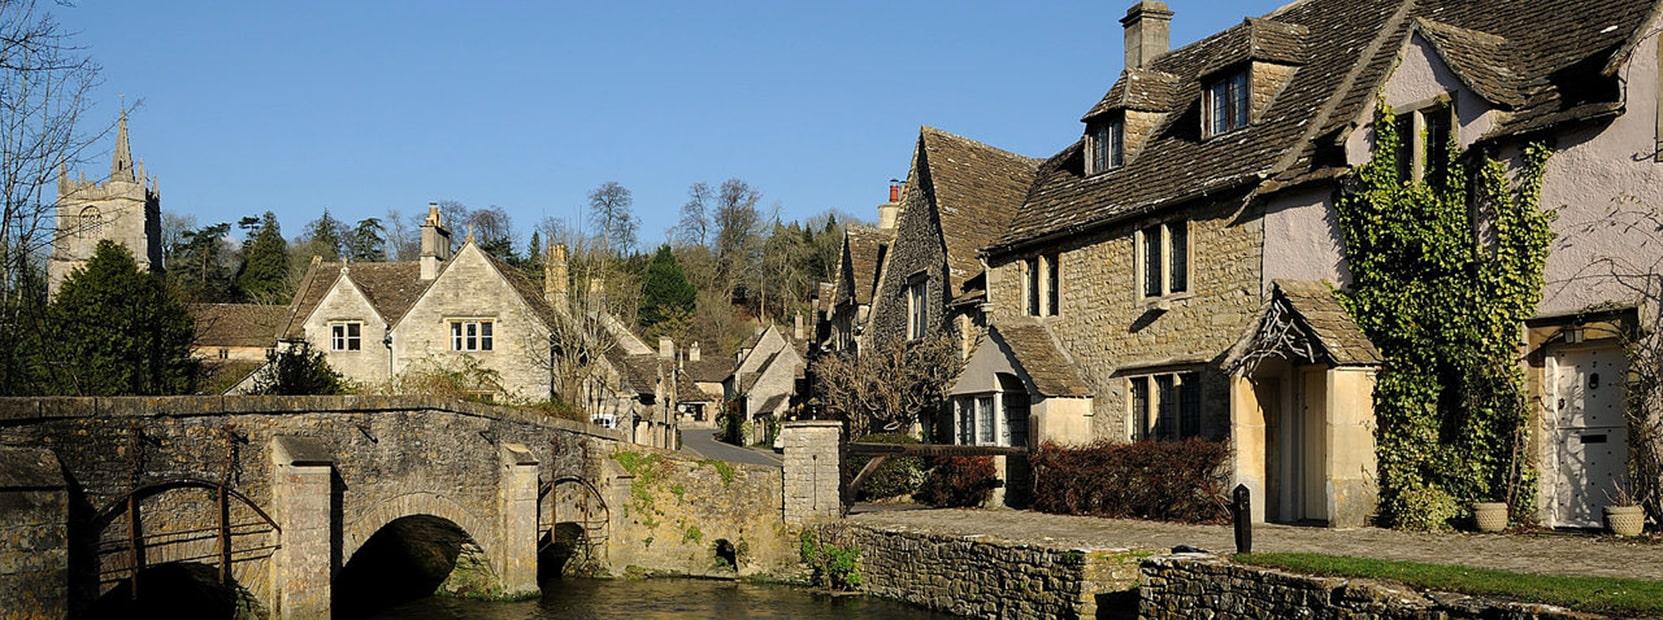 castlecombe-min